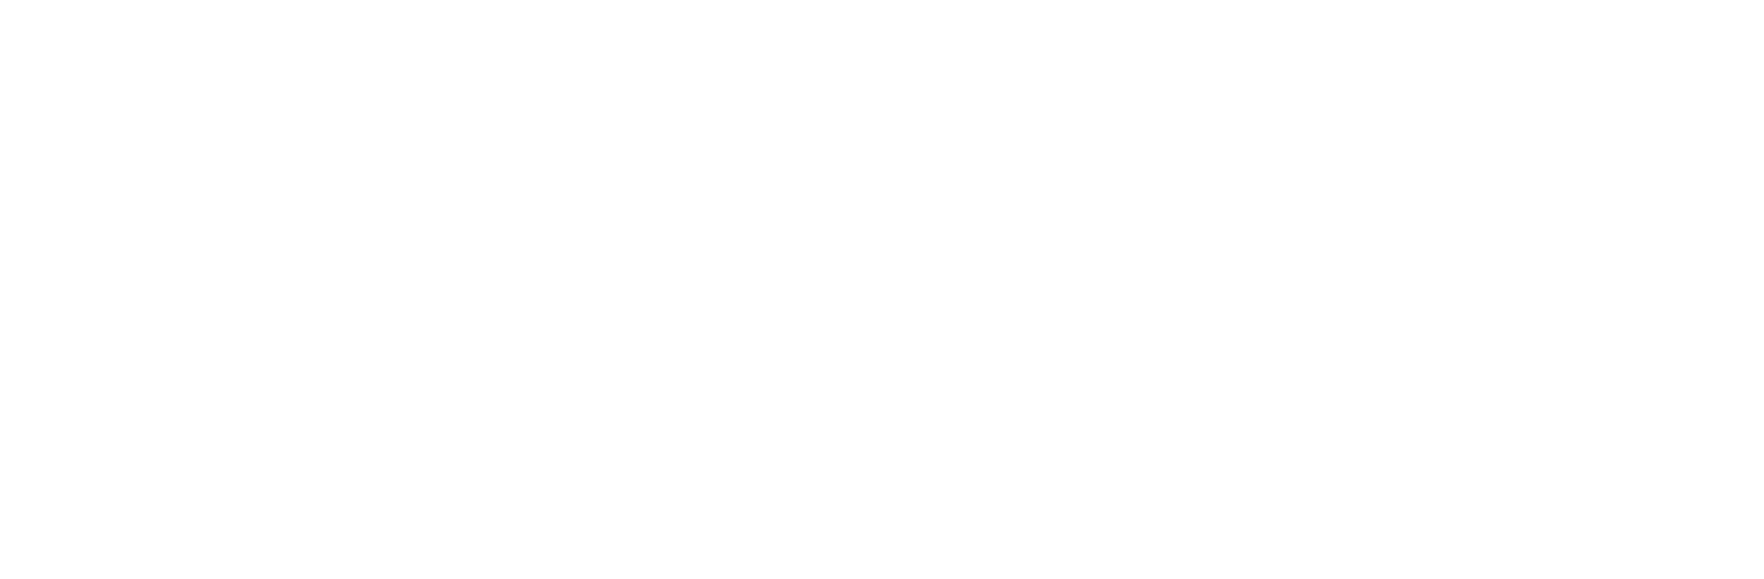 SONDR logo